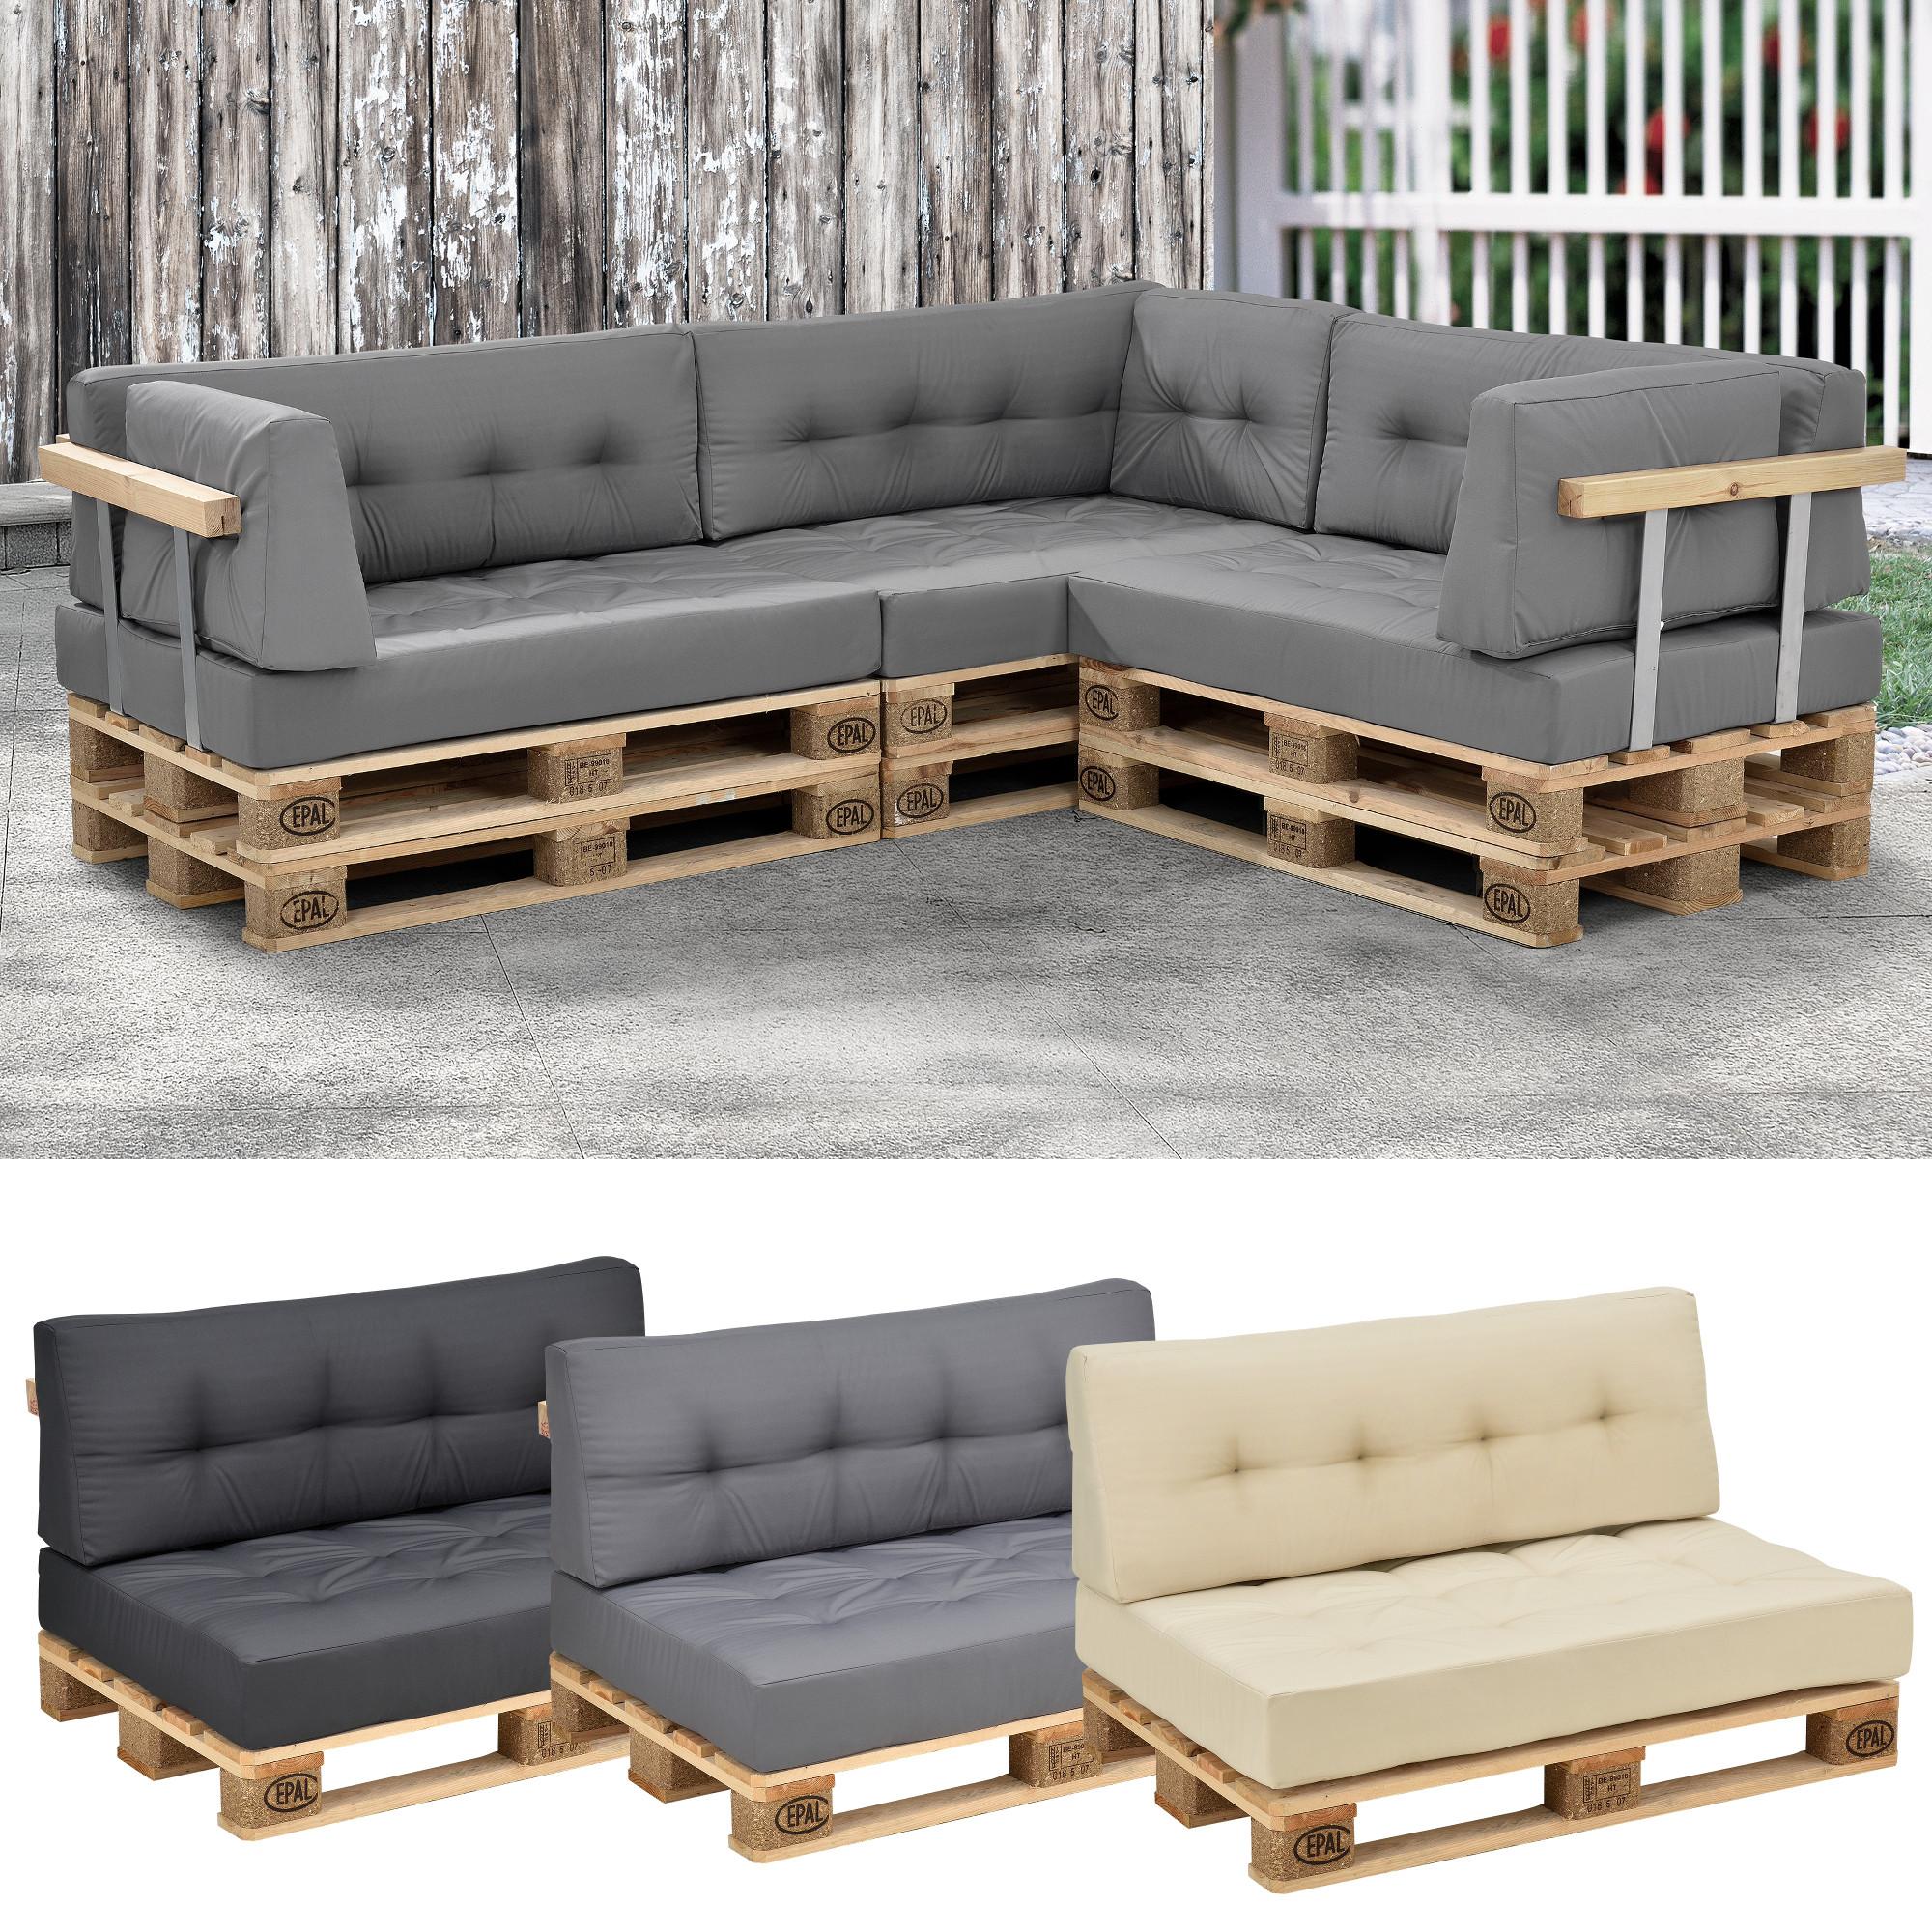 Paletten Sofa Kissen  [ensa] 1x Sitzpolster Palettenkissen In Outdoor